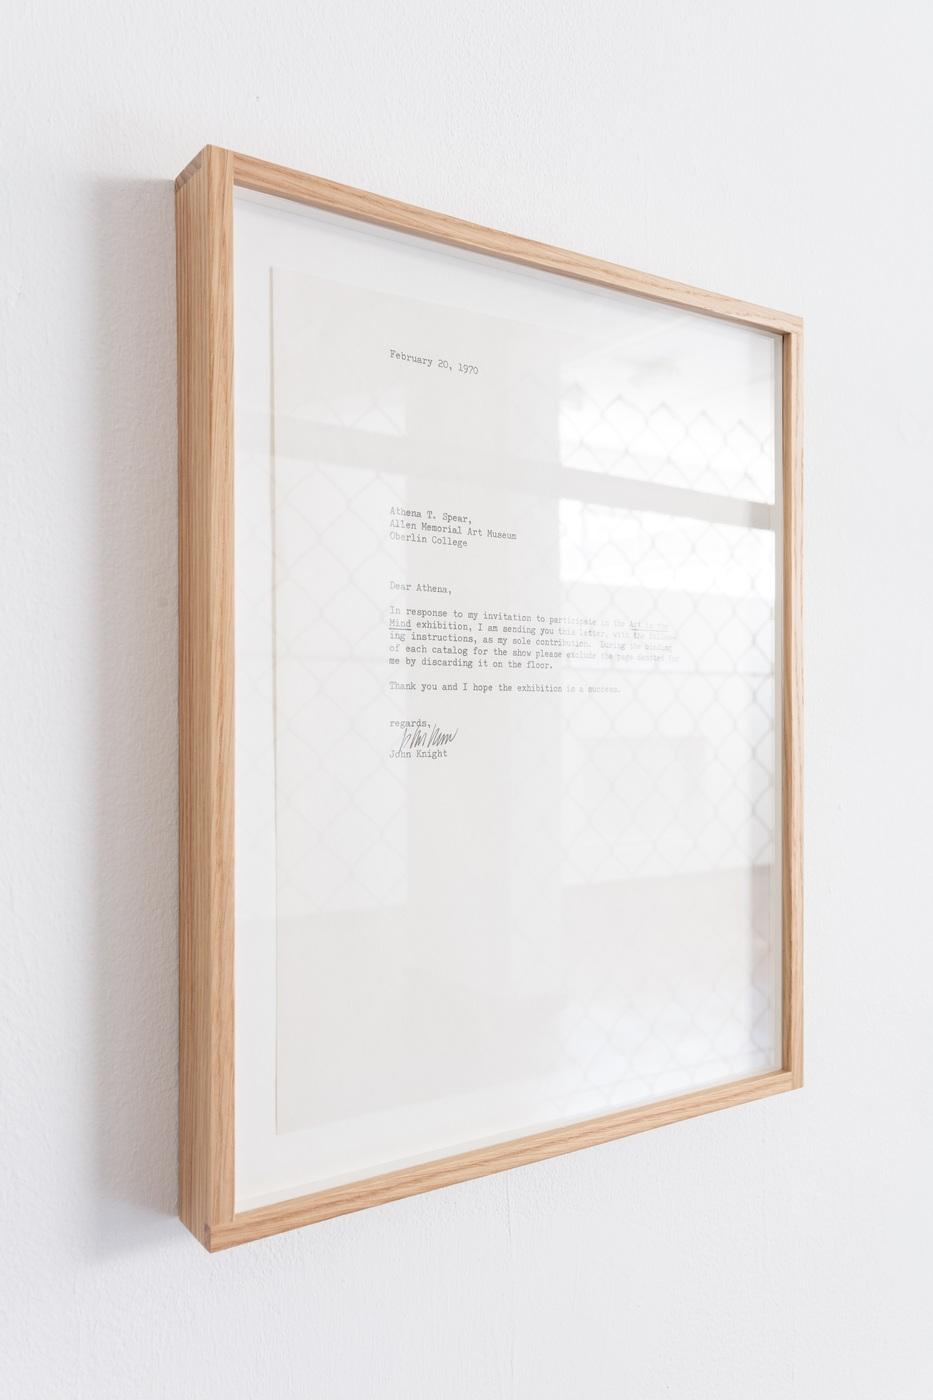 160421-John-Knight-Cabinet-0041